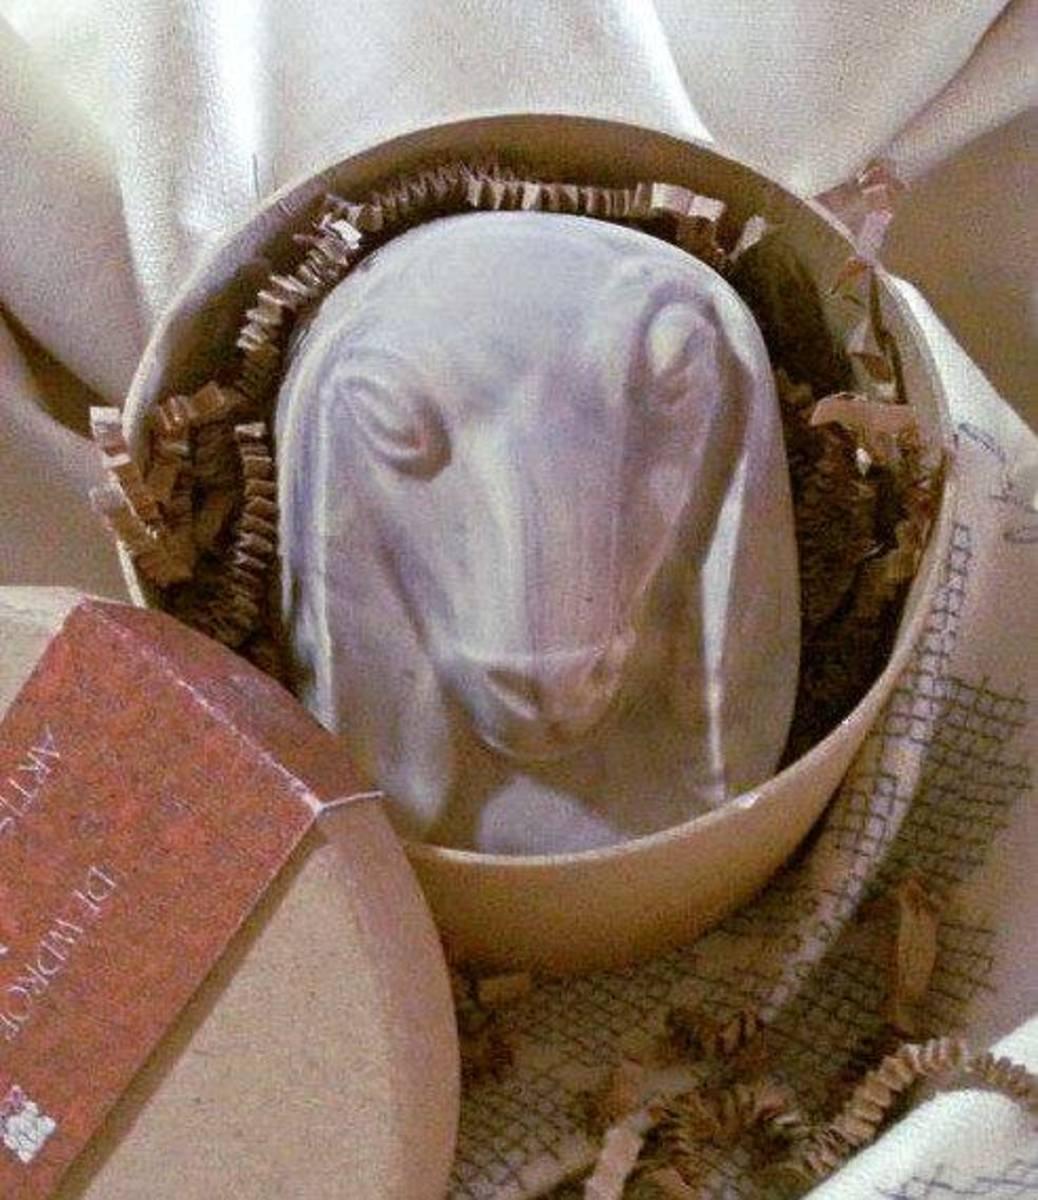 Goat-milk soap in a gift box